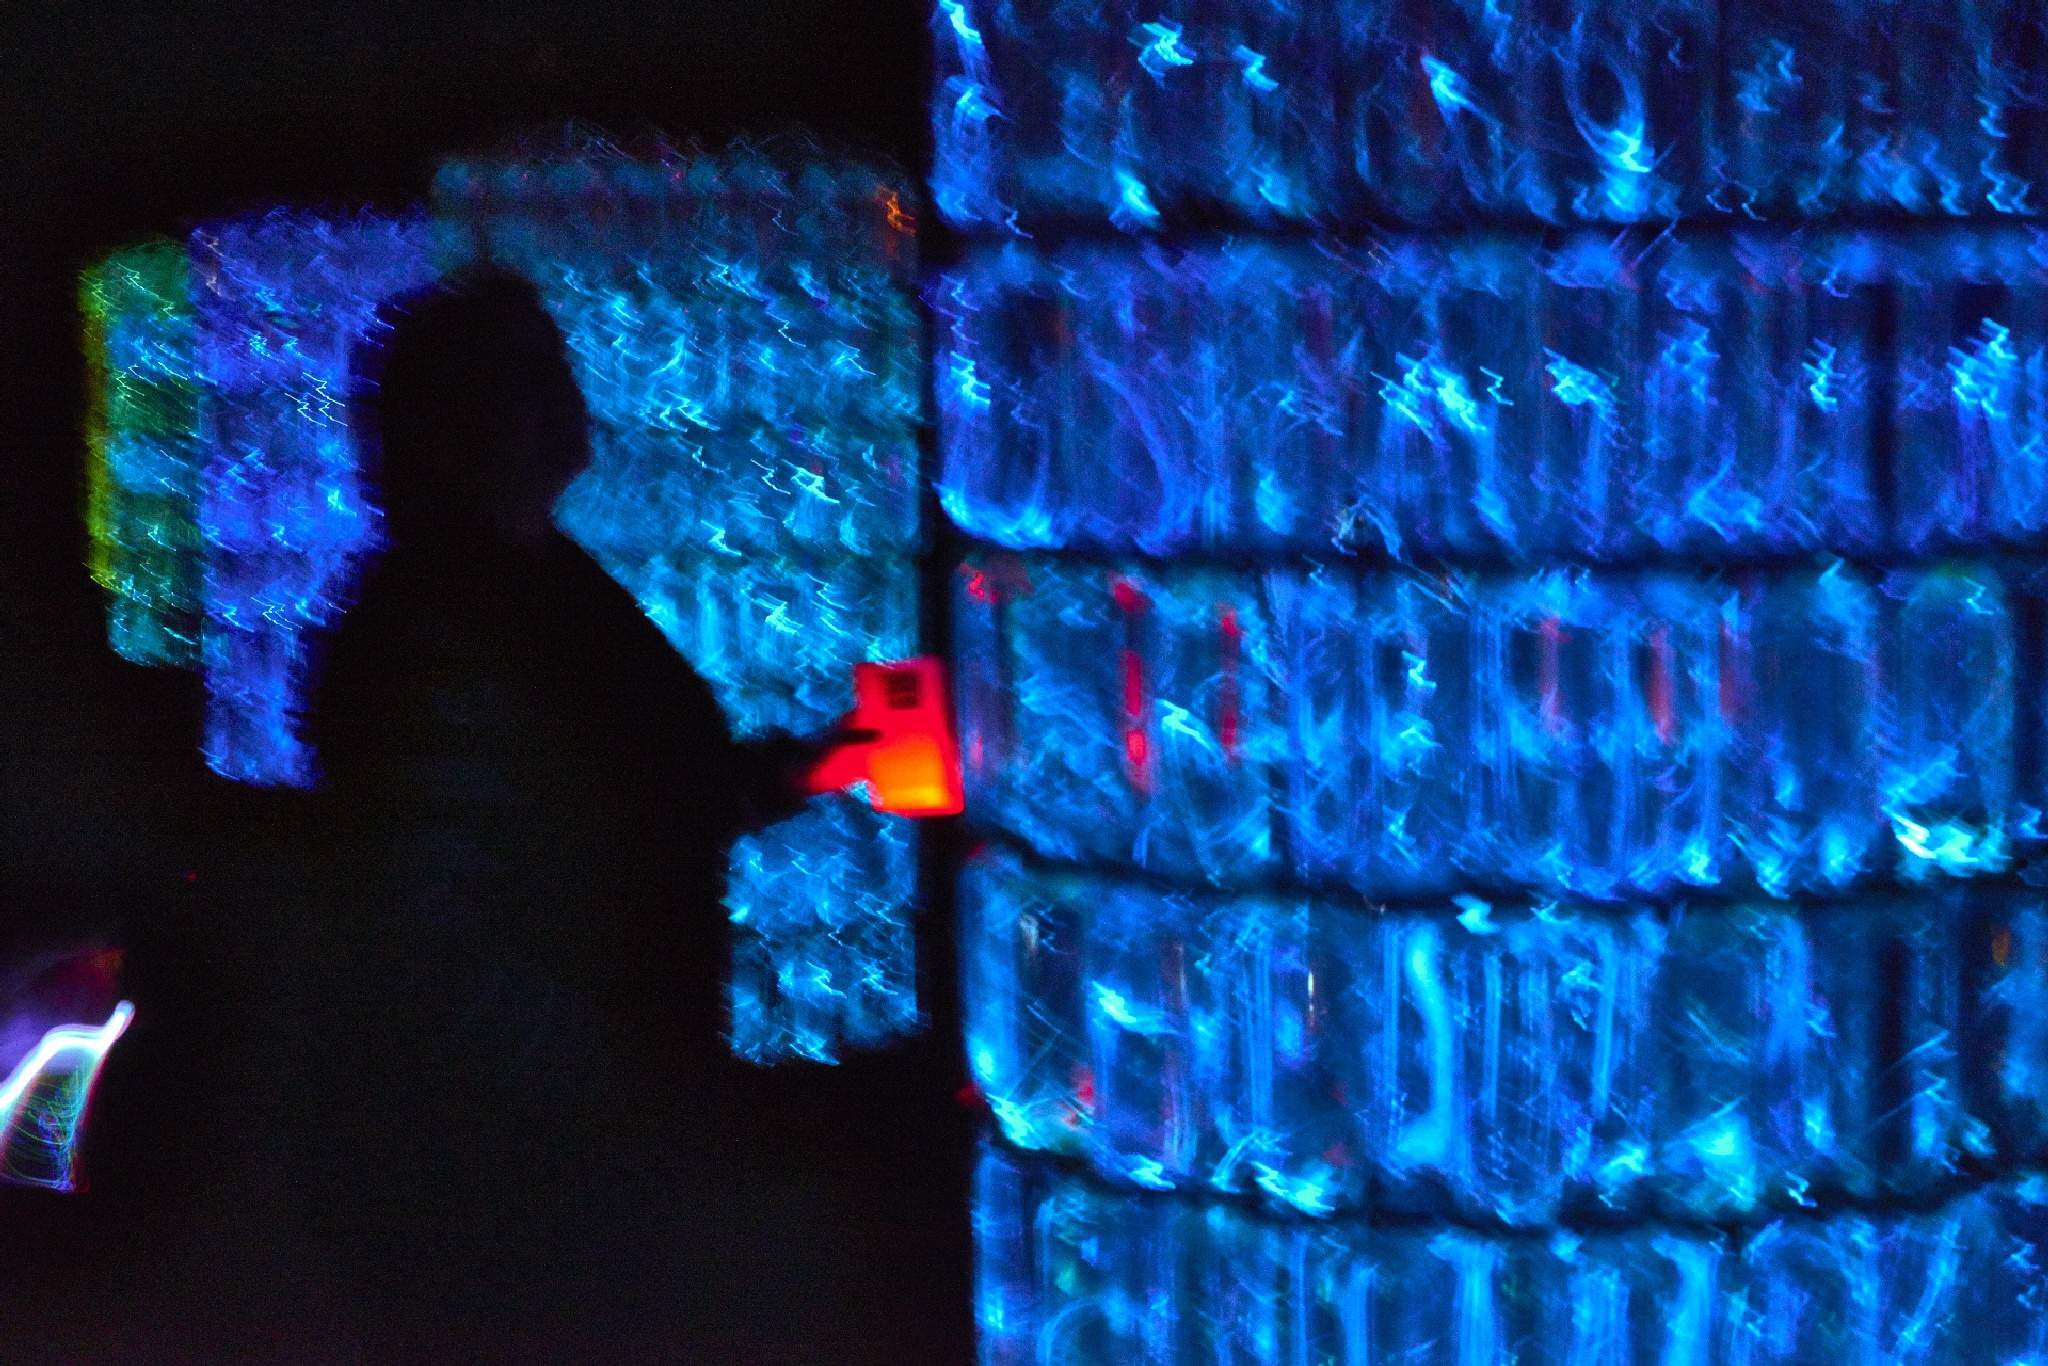 Ethereal Luminescence 42106 by PTPhoto